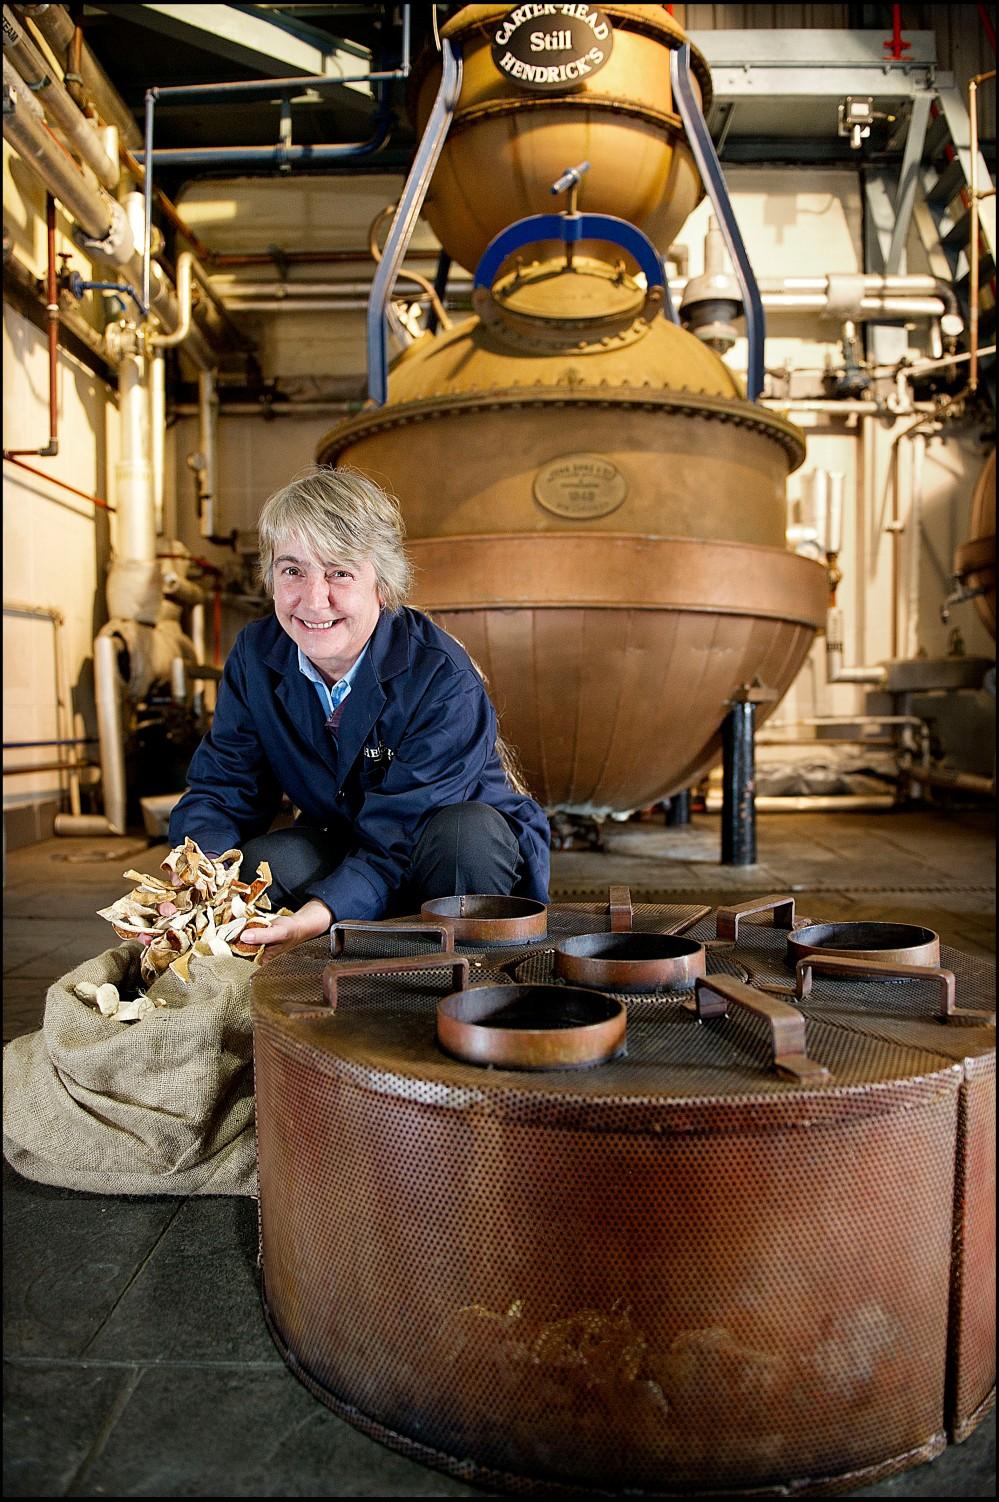 Hendrick's Master Distiller Lesley Gracie